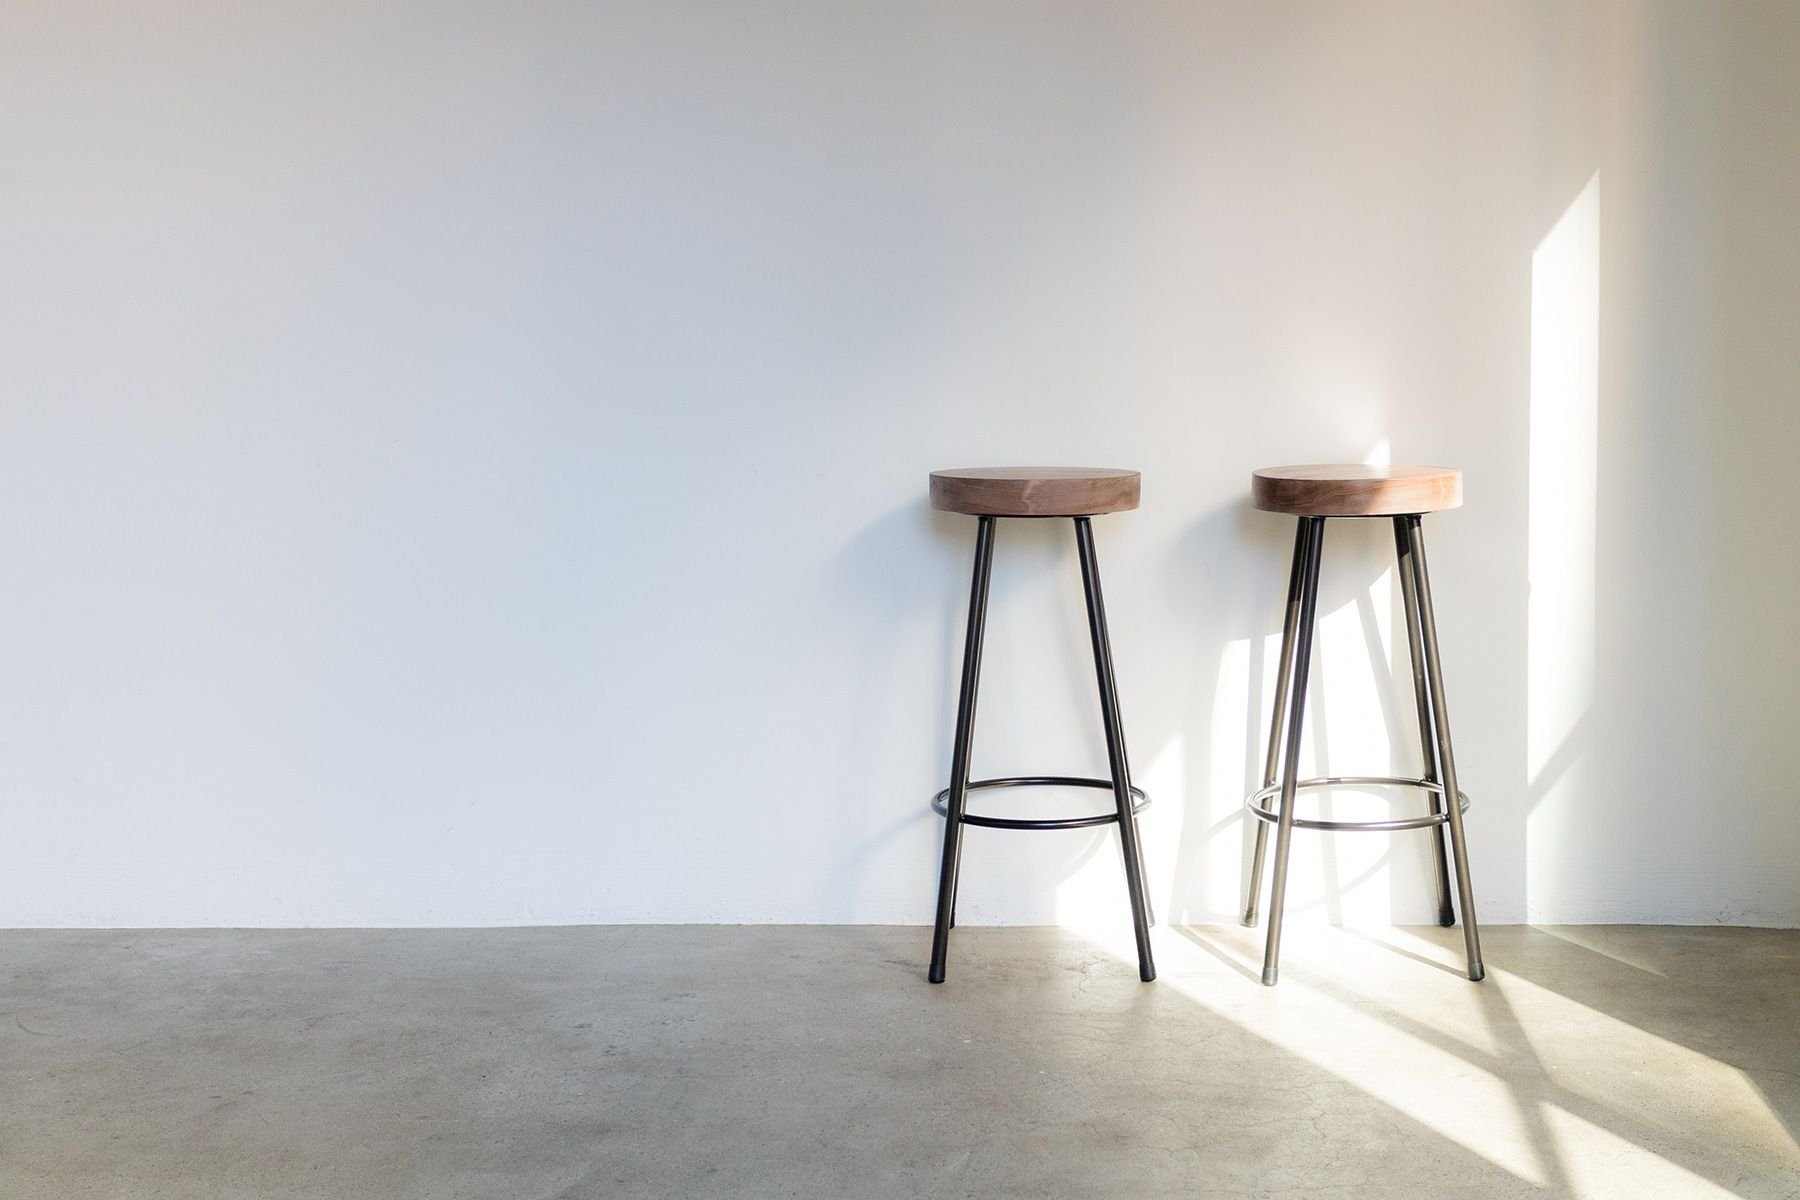 Studio Serato 水道橋 (スタジオセラート水道橋)無垢木材のスツール×2